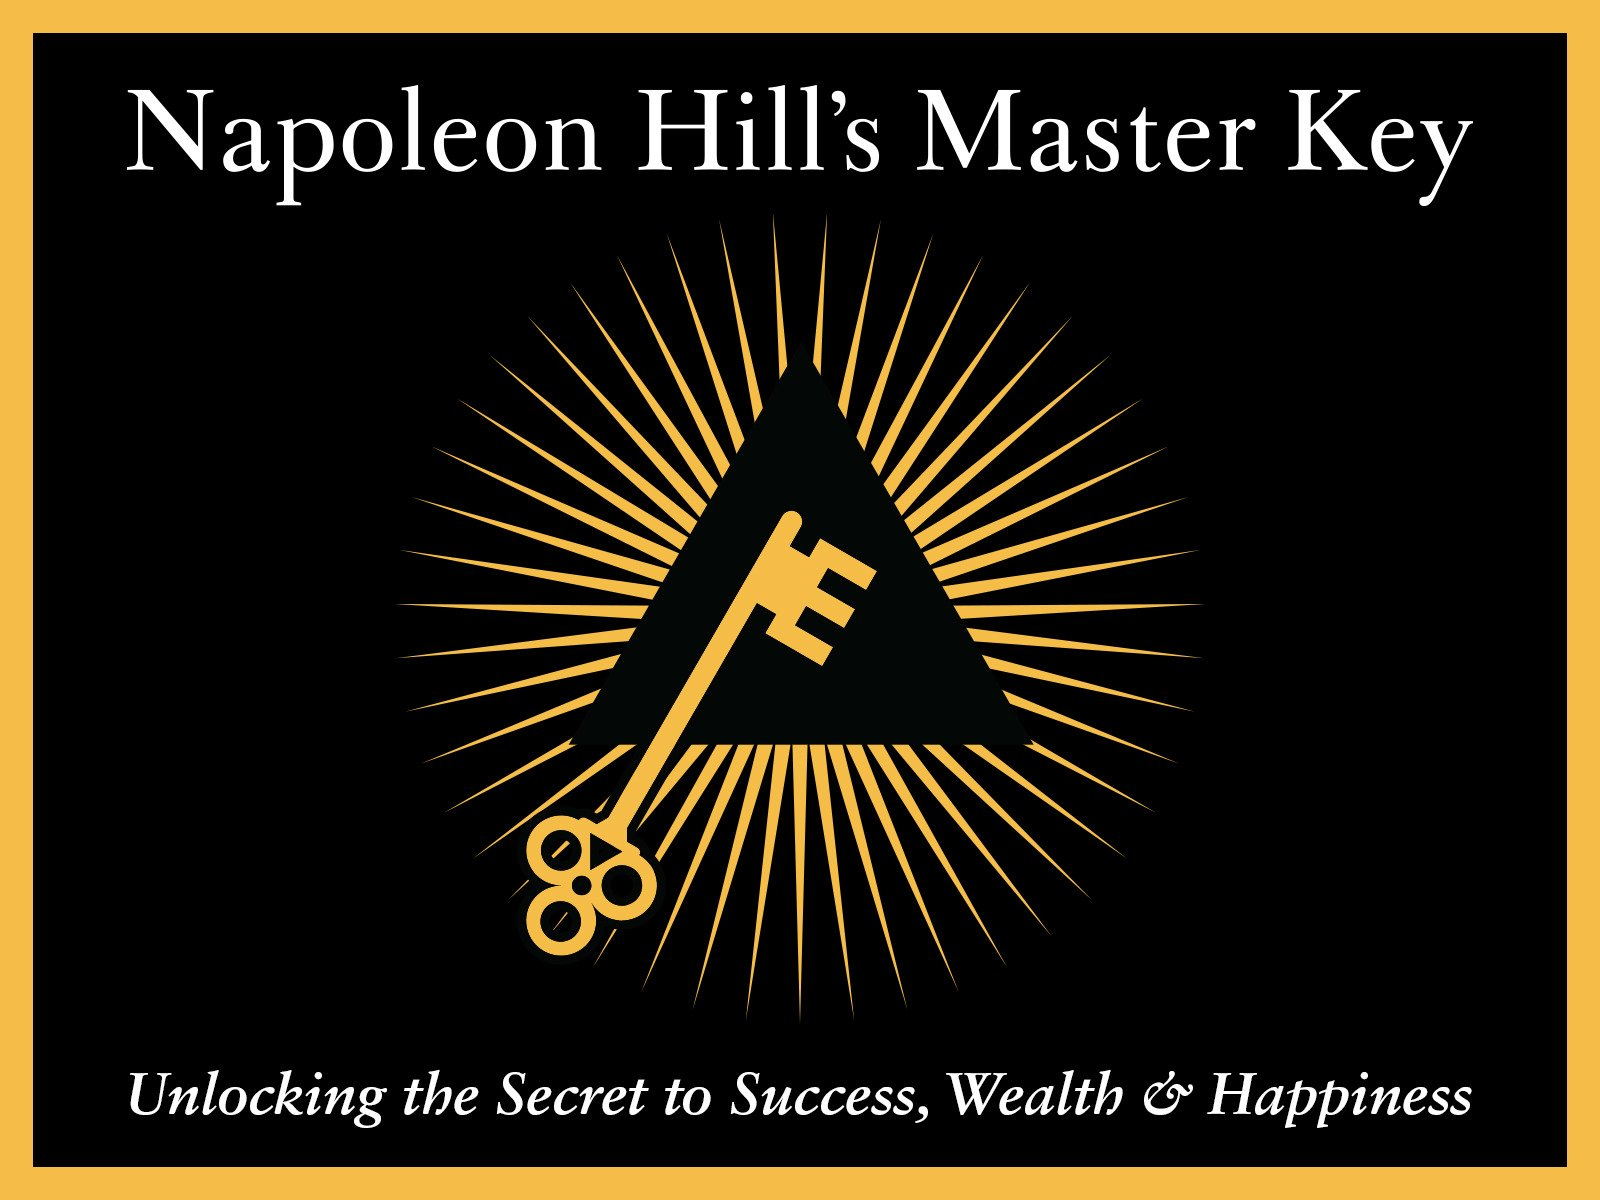 Napoleon Hill's Mater Key